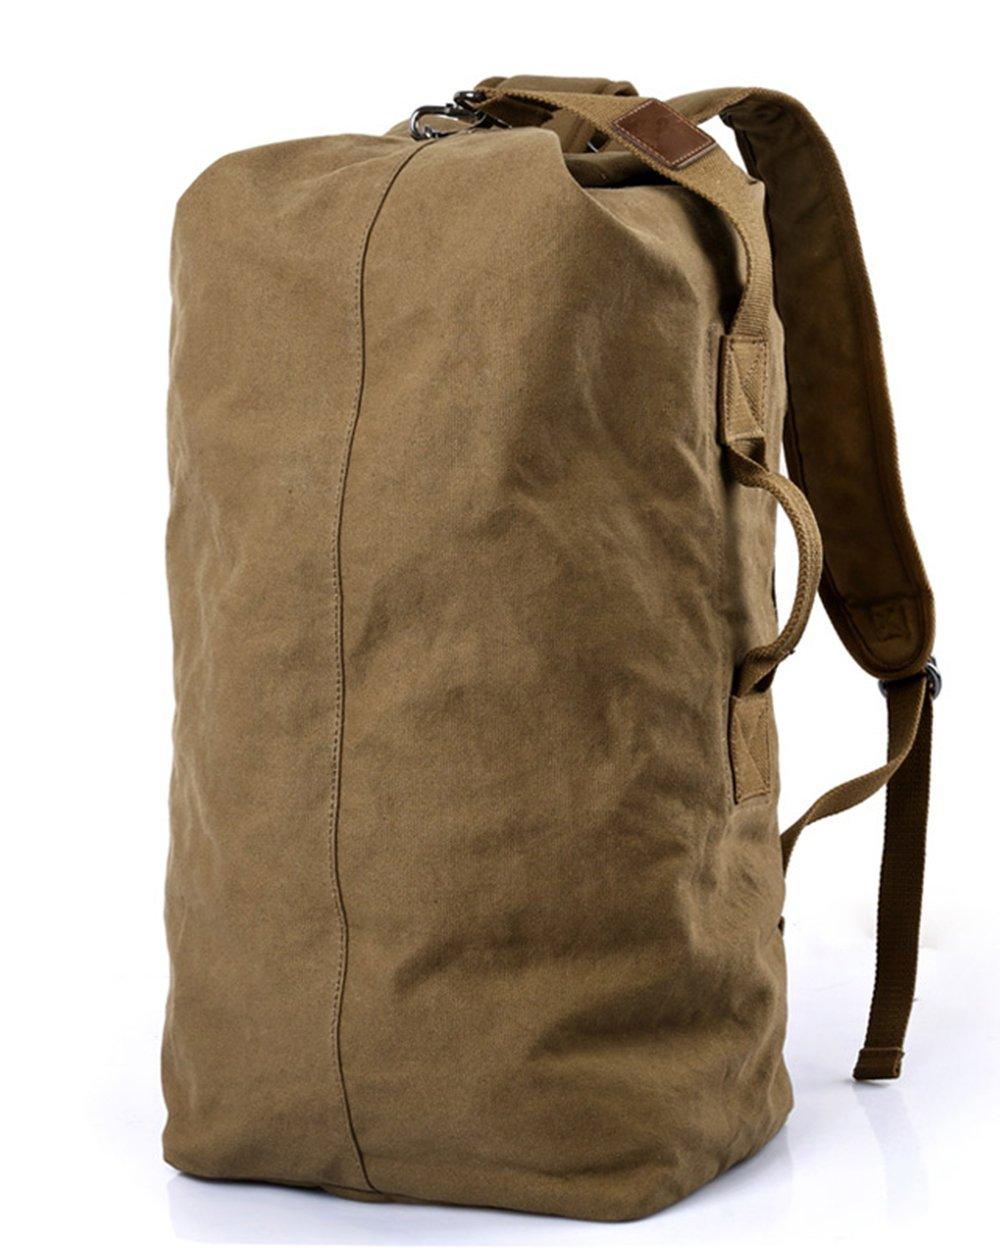 WOMJIA Oversized Heavy Duty Canvas Travel Duffel Bag 40 Liter Brown